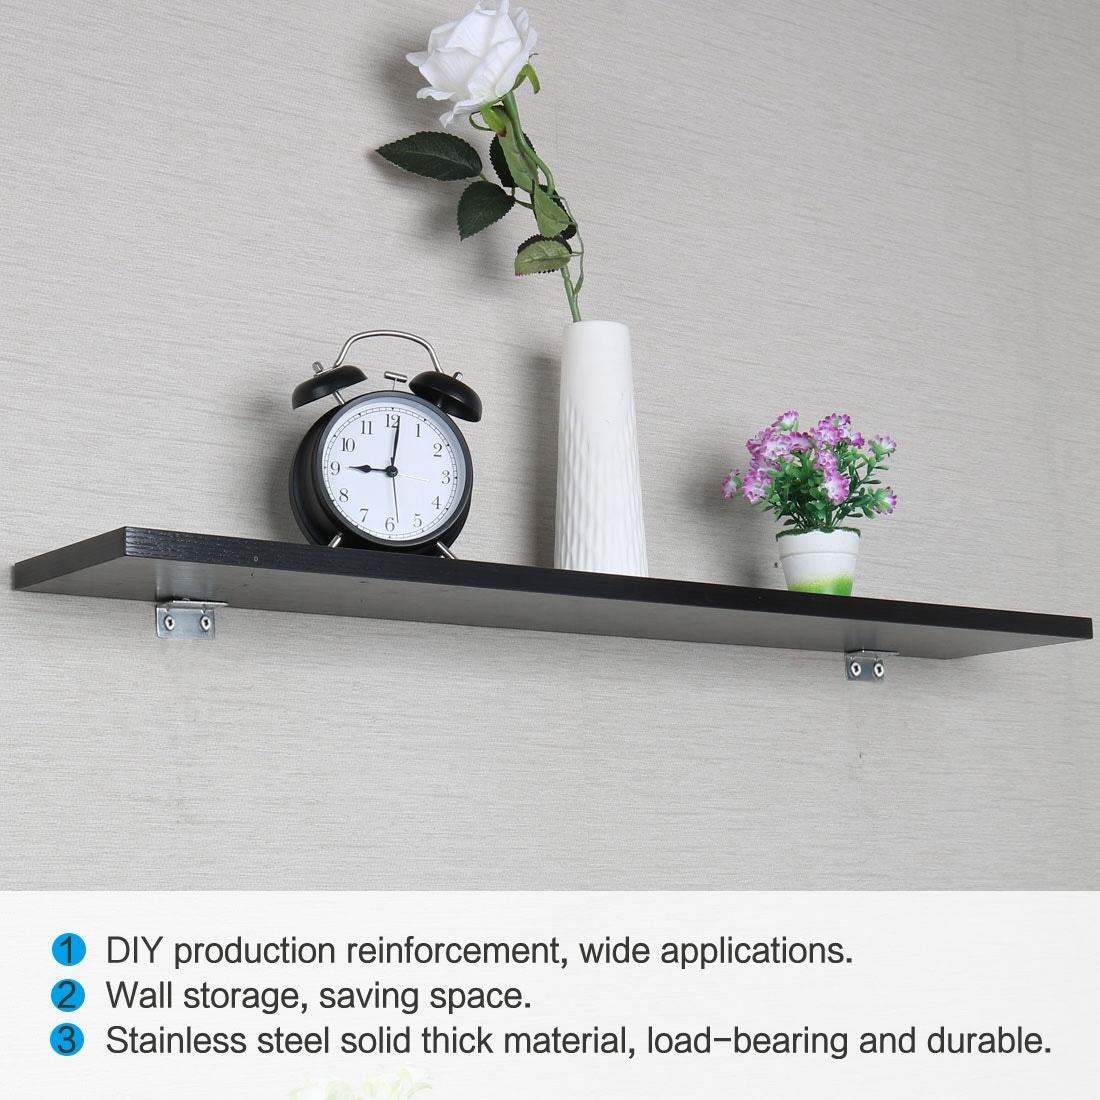 20pcs Angle Bracket Metal 40x20mm Corner Fastener L Shaped Right Angle  Bracket Corner Protector Shelf Support for Furniture